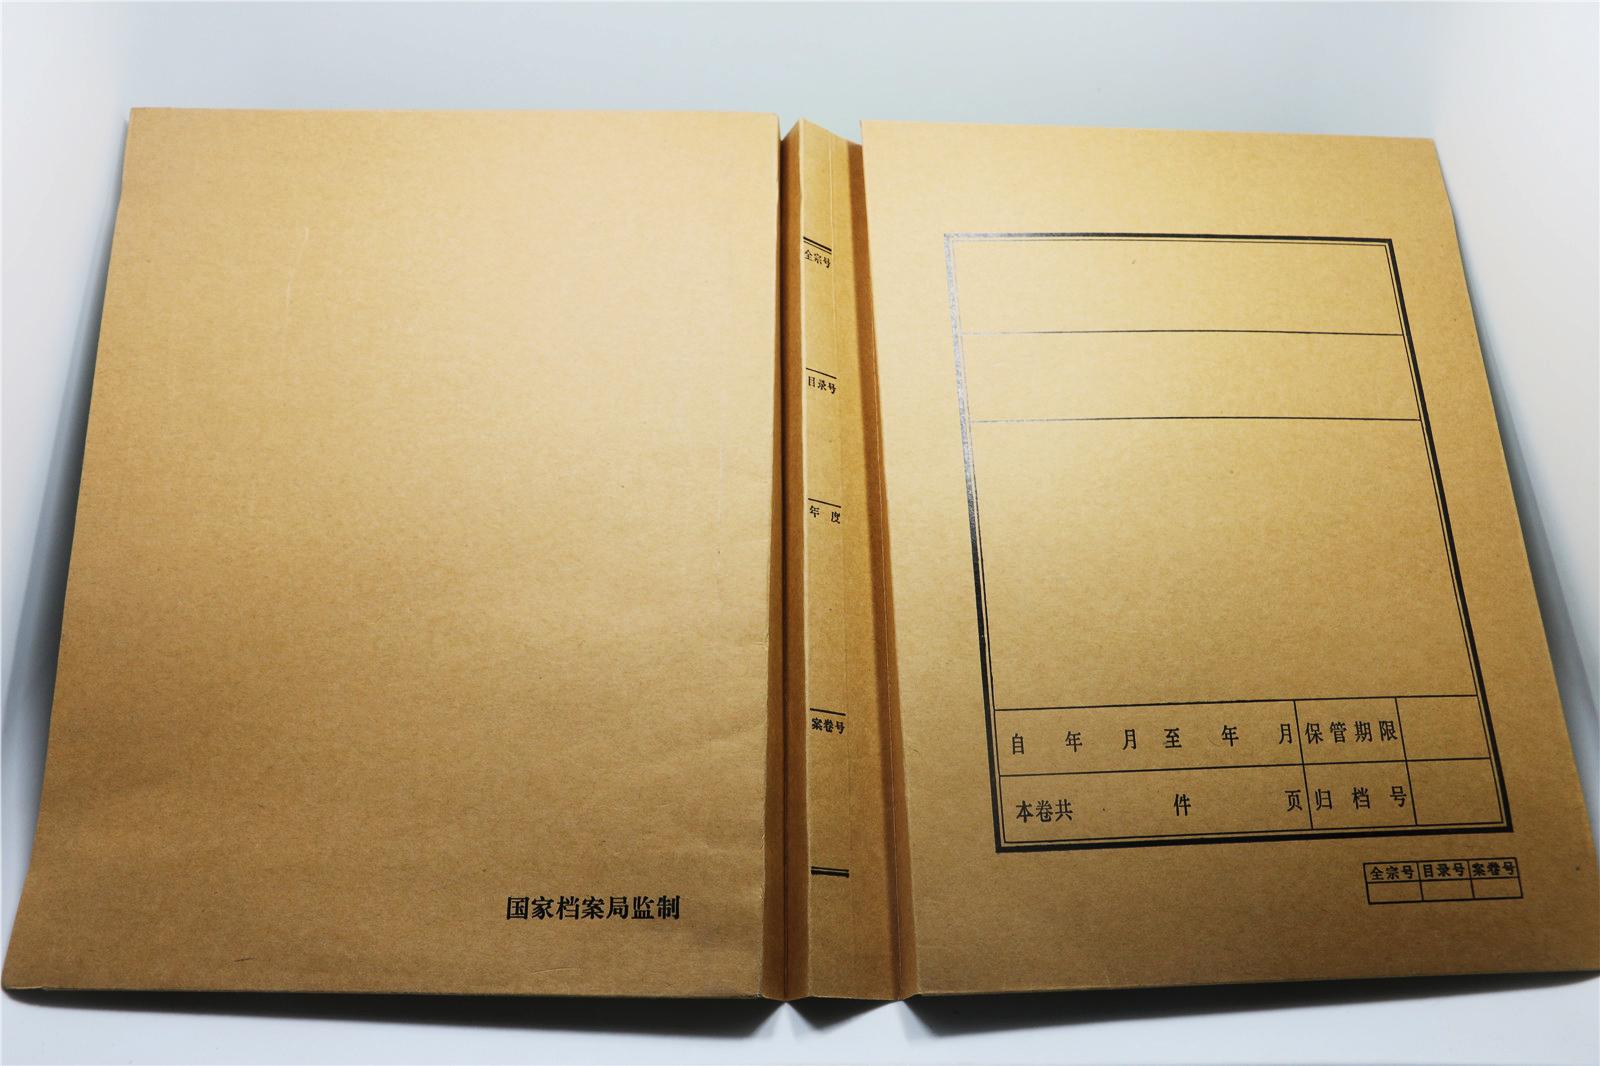 A4折叠200克皮卡纸档案封面卷皮 封皮 卷宗装订牛皮封面凭证包邮